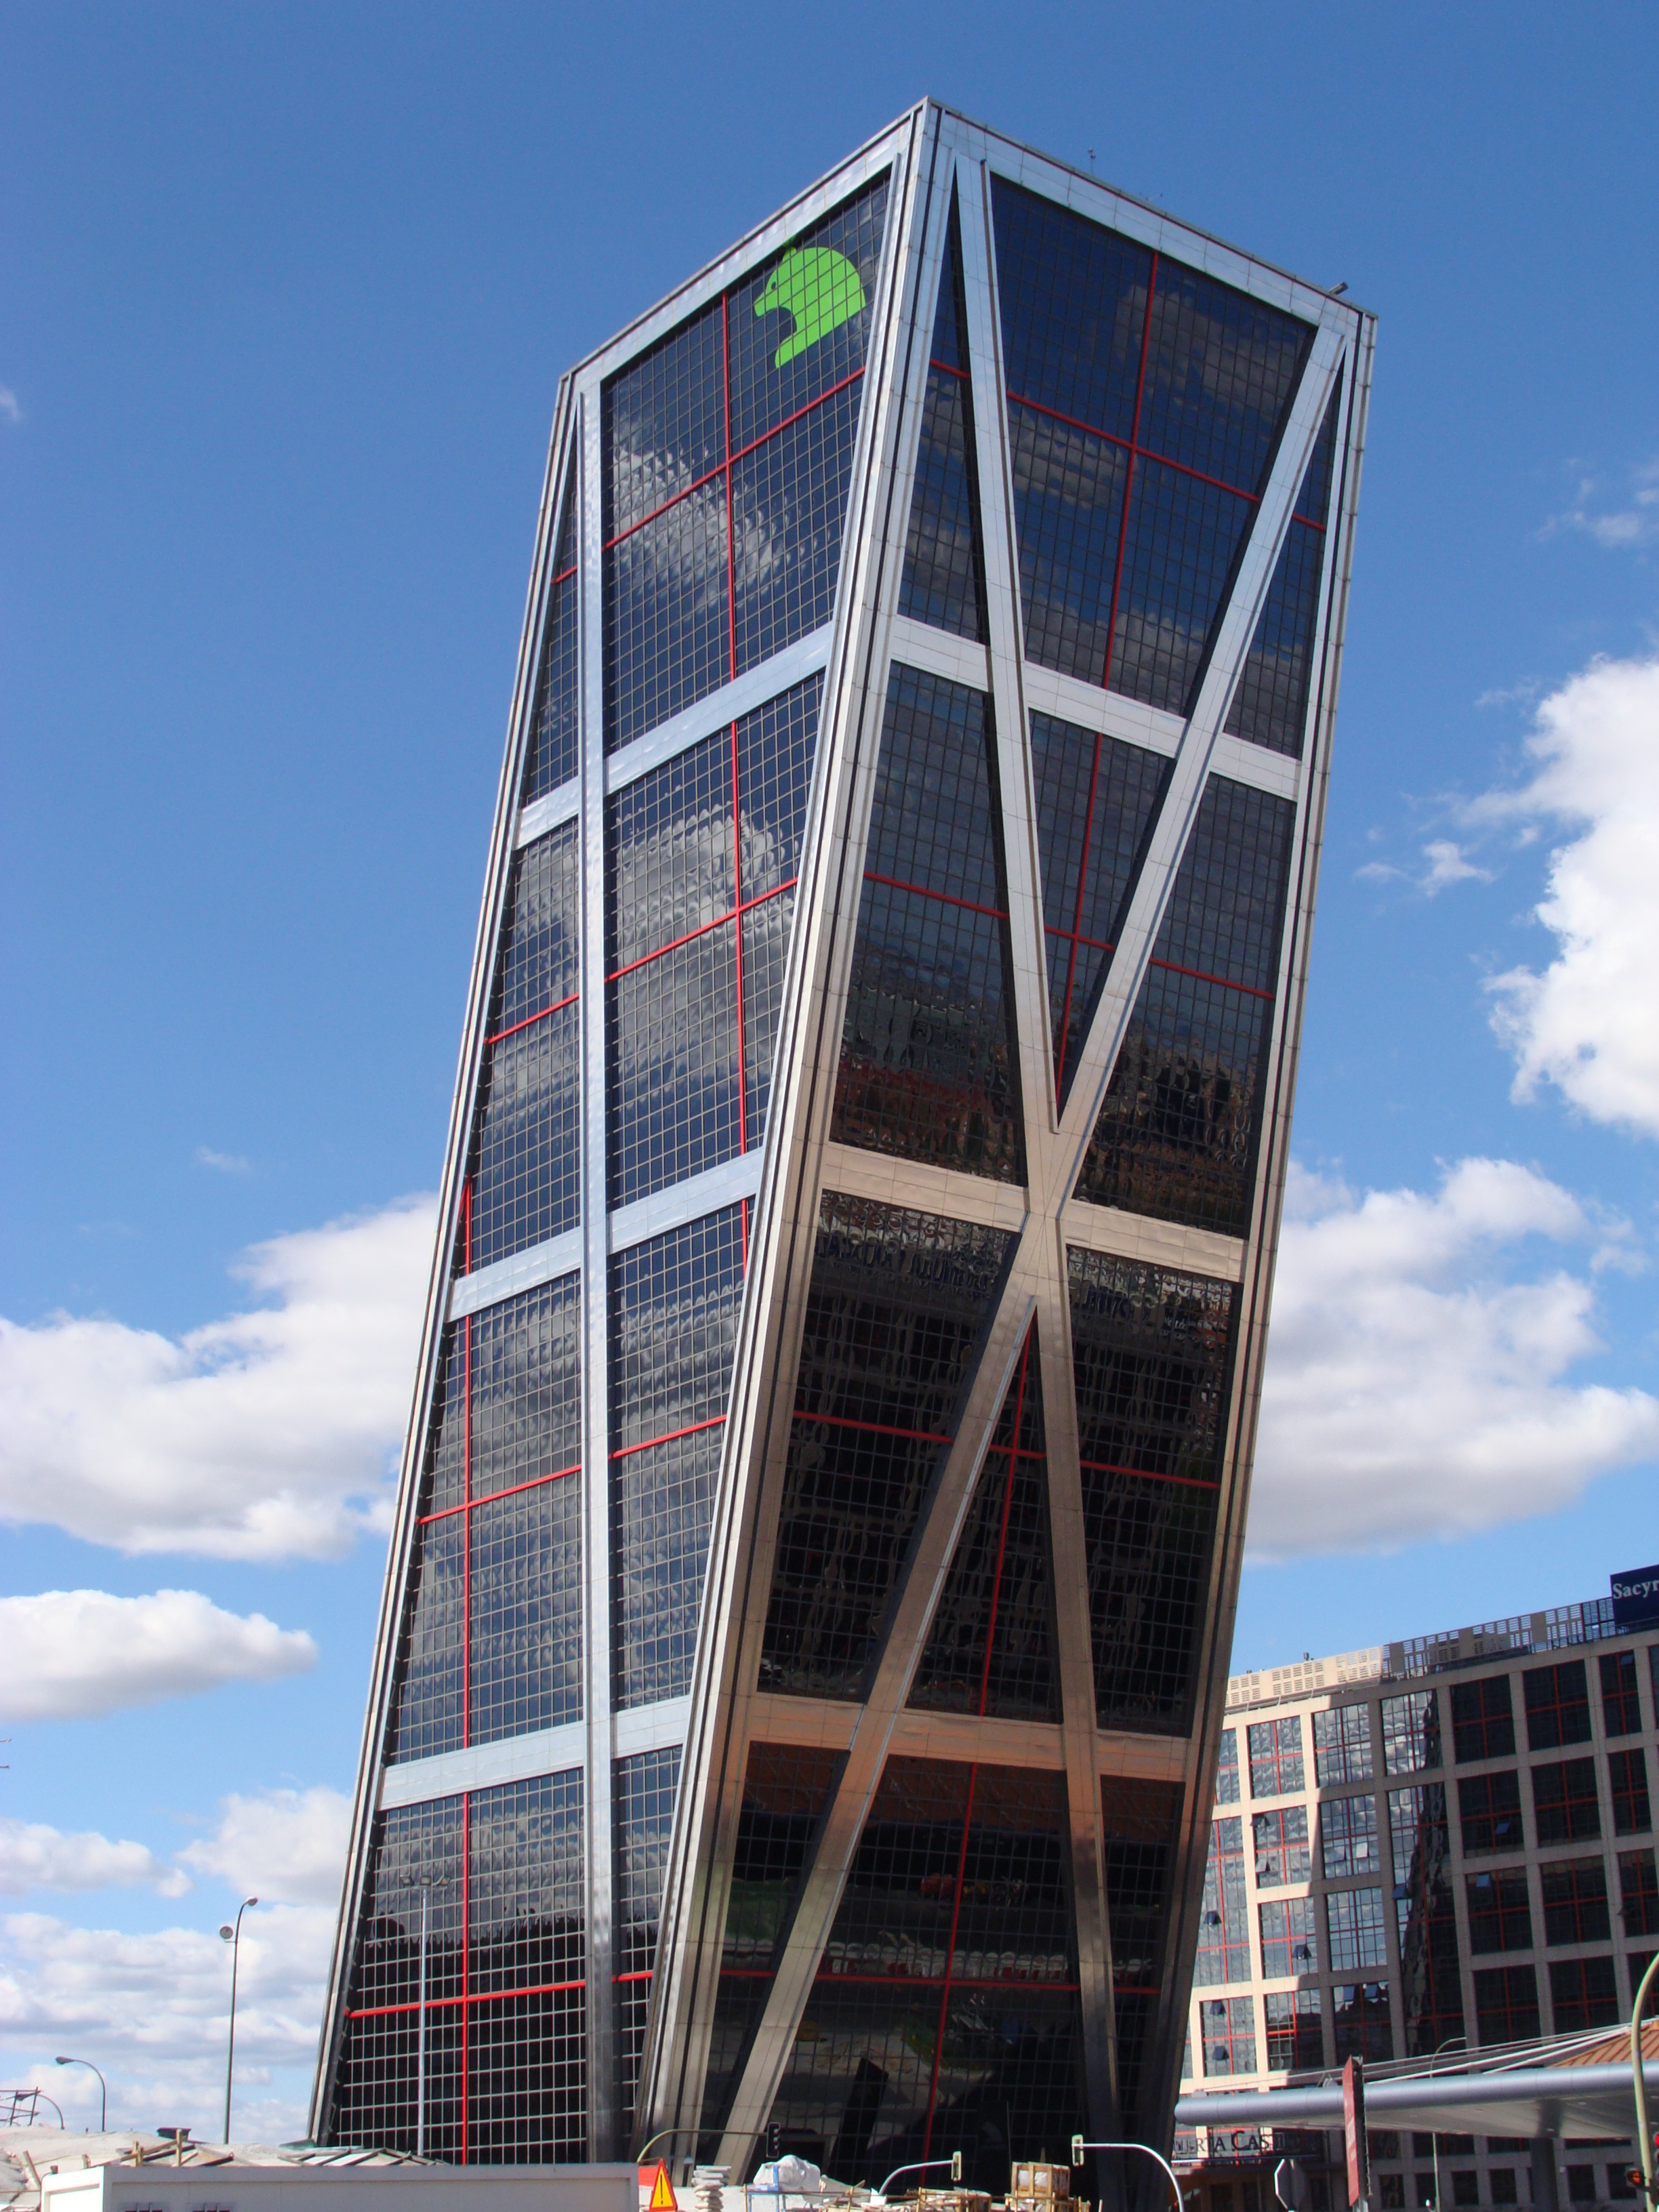 http://upload.wikimedia.org/wikipedia/commons/1/1d/Puerta_de_Europa_(Caja_Madrid).006_-_Madrid.JPG